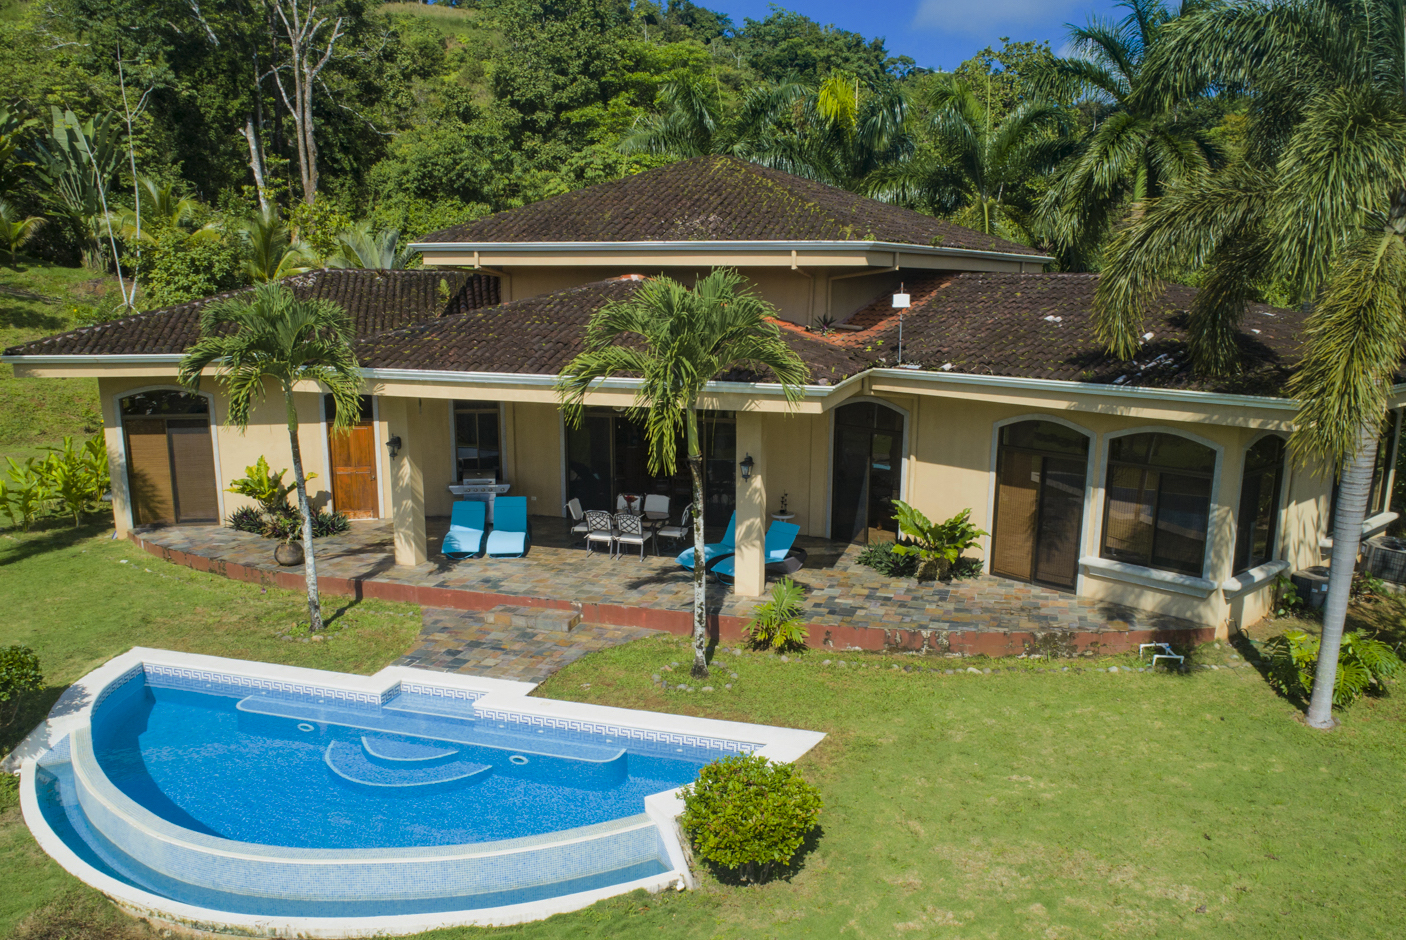 Matapalo-Costa-Rica-property-costaricarealestateMAT079.jpg